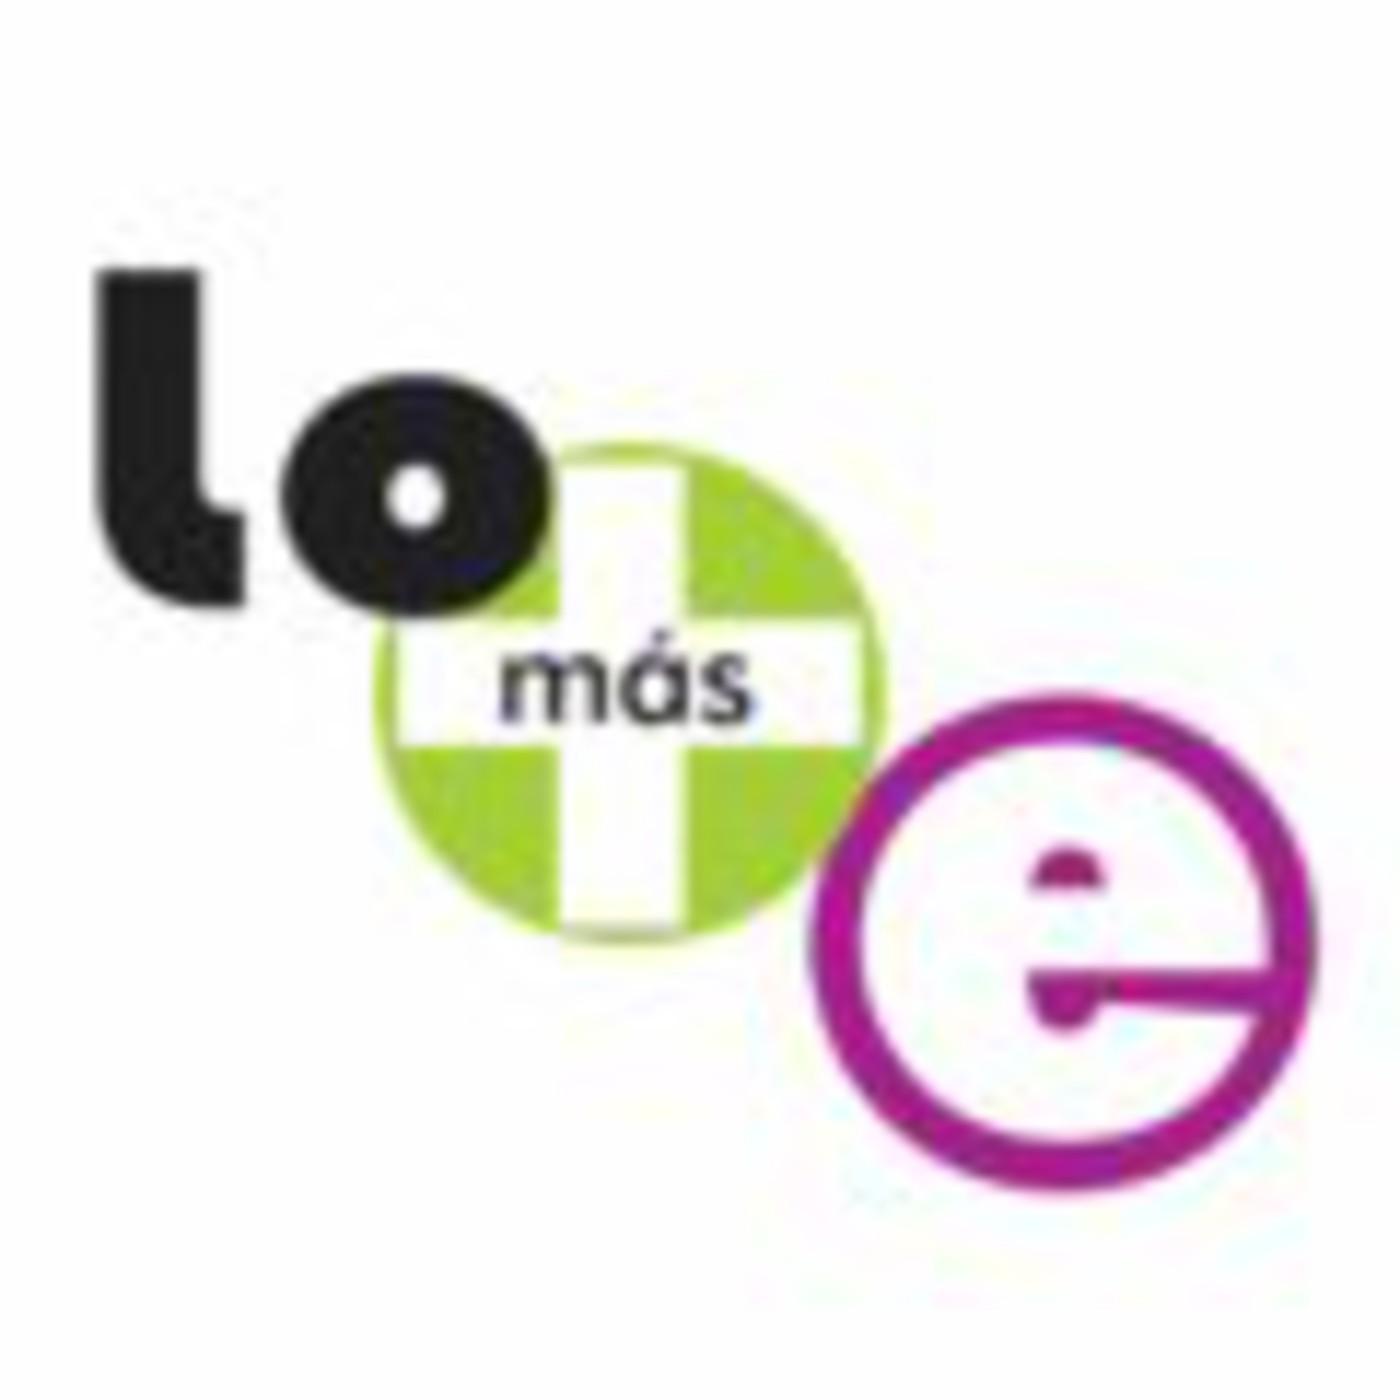 Lomaselite.com